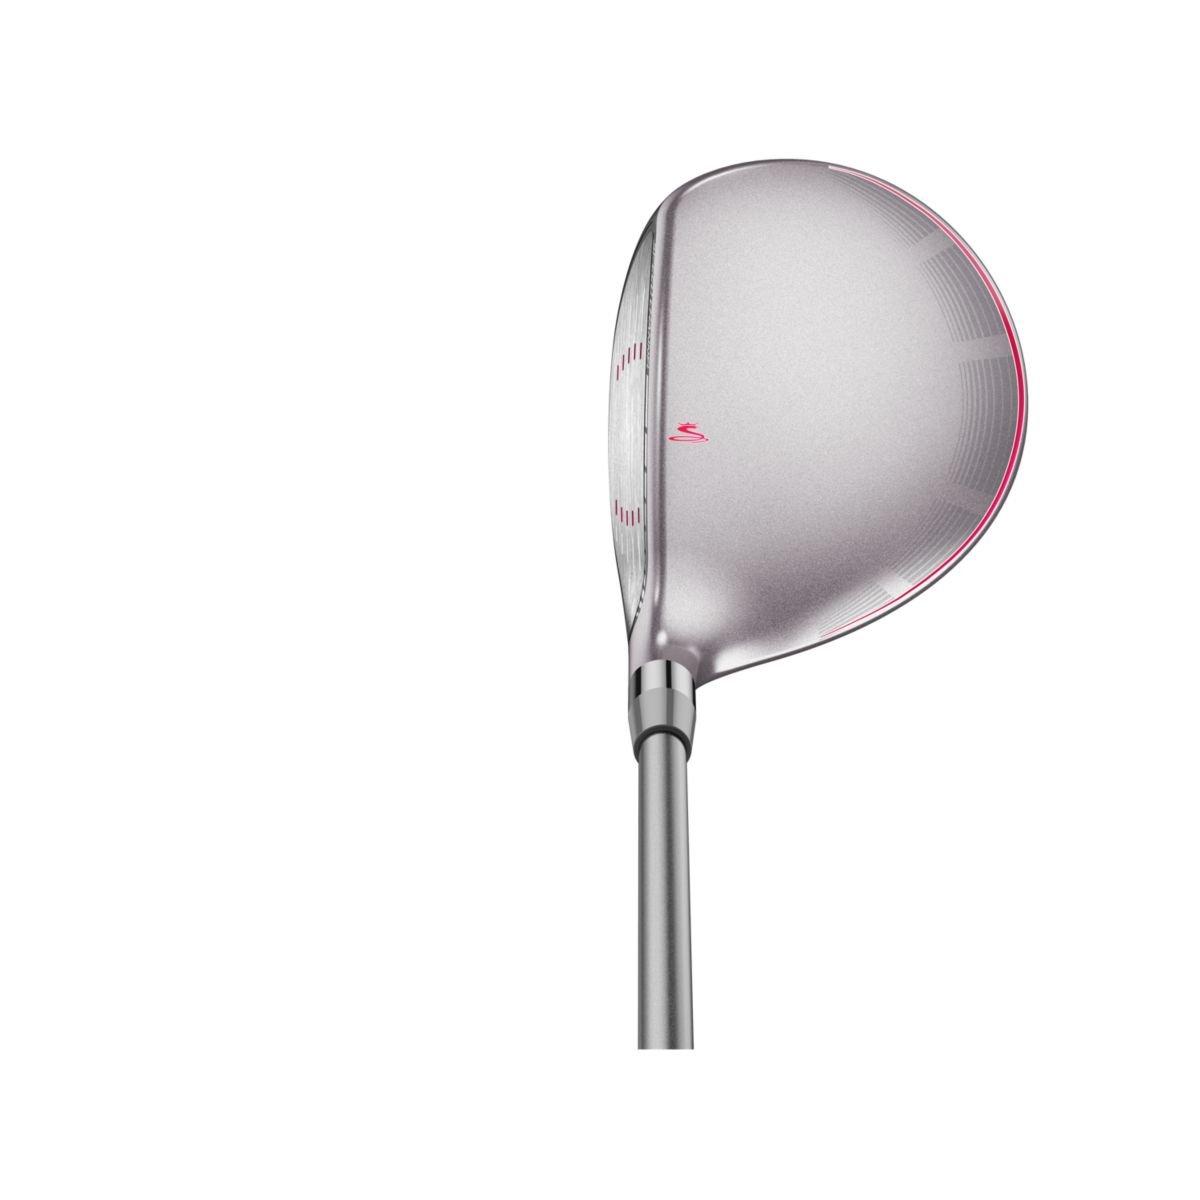 Amazon.com: Cobra Golf Mujer Fly-Z XL Fairway Madera: Sports ...